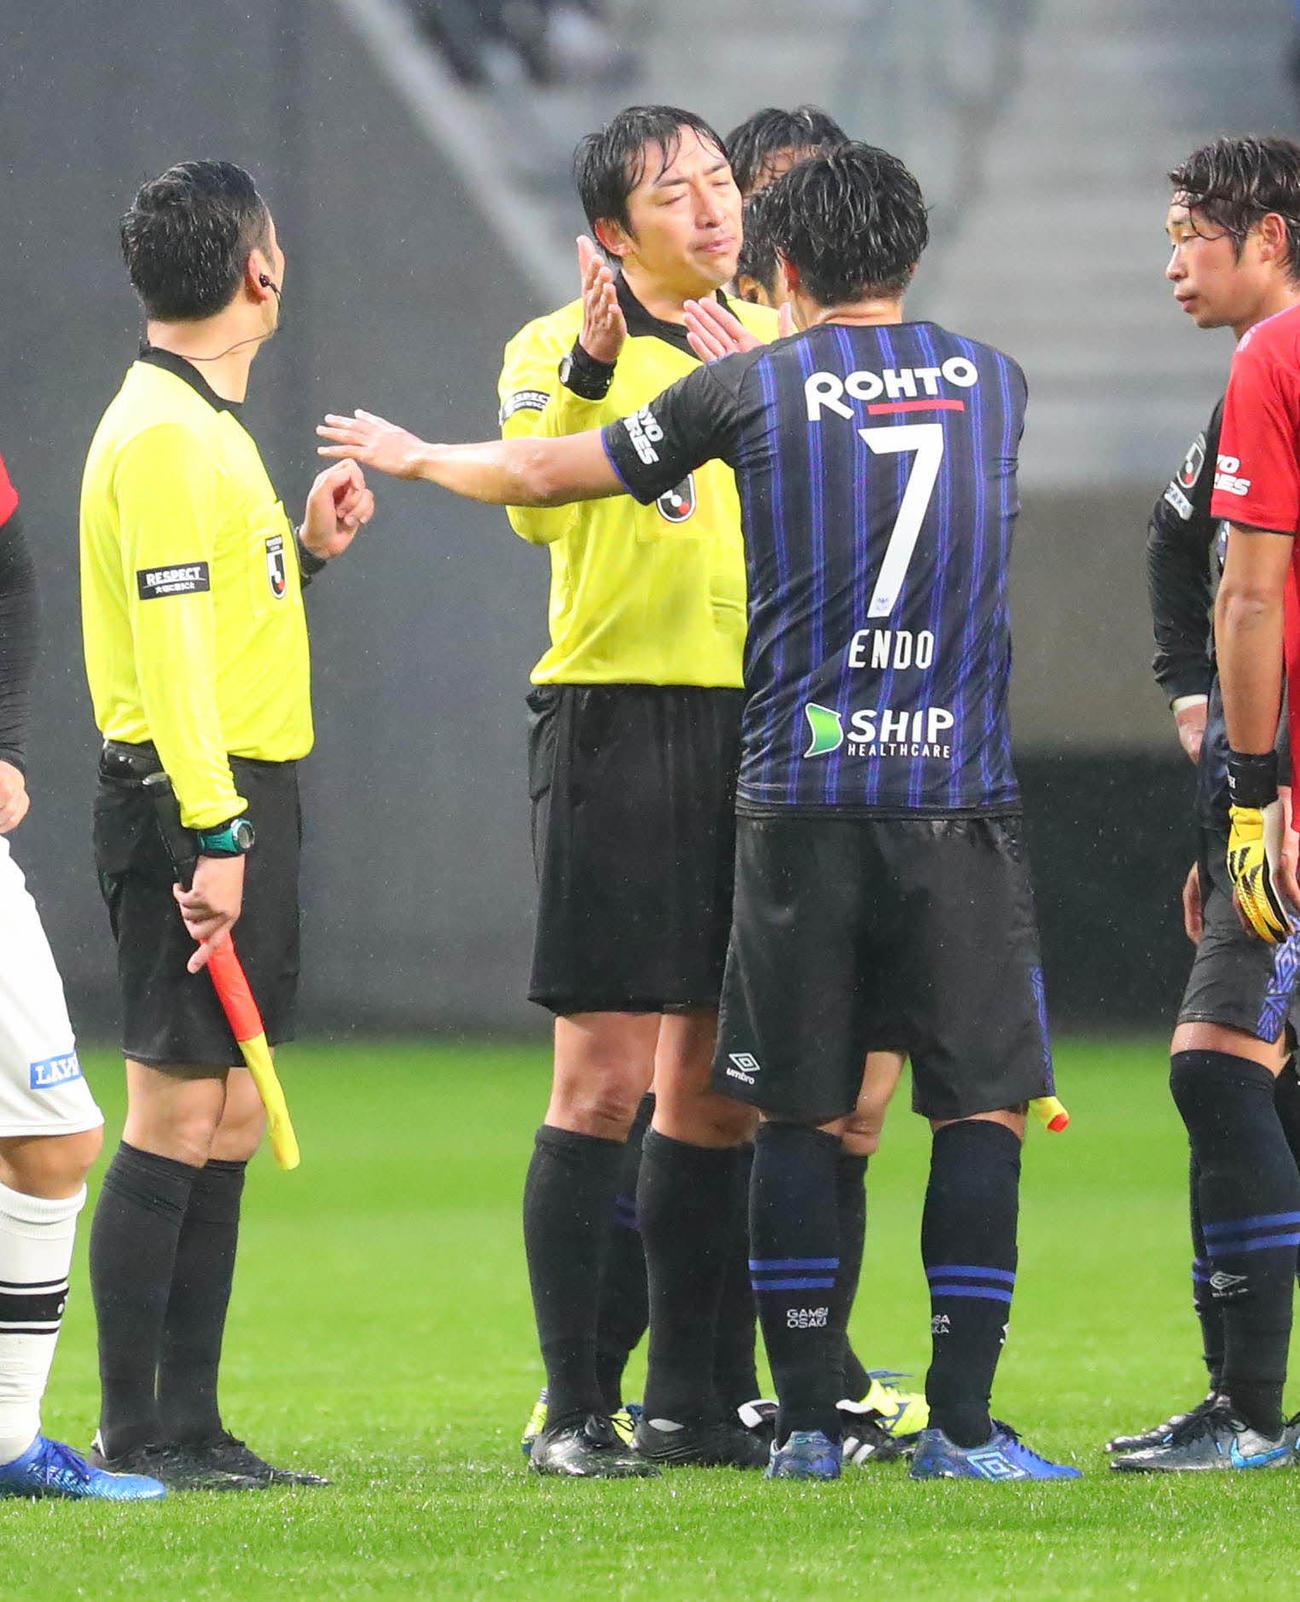 G大阪対柏 試合後、G大阪DF新里亮のゴールは取り消しに抗議するG大阪MF遠藤保仁(右)ら(撮影・宮崎幸一)